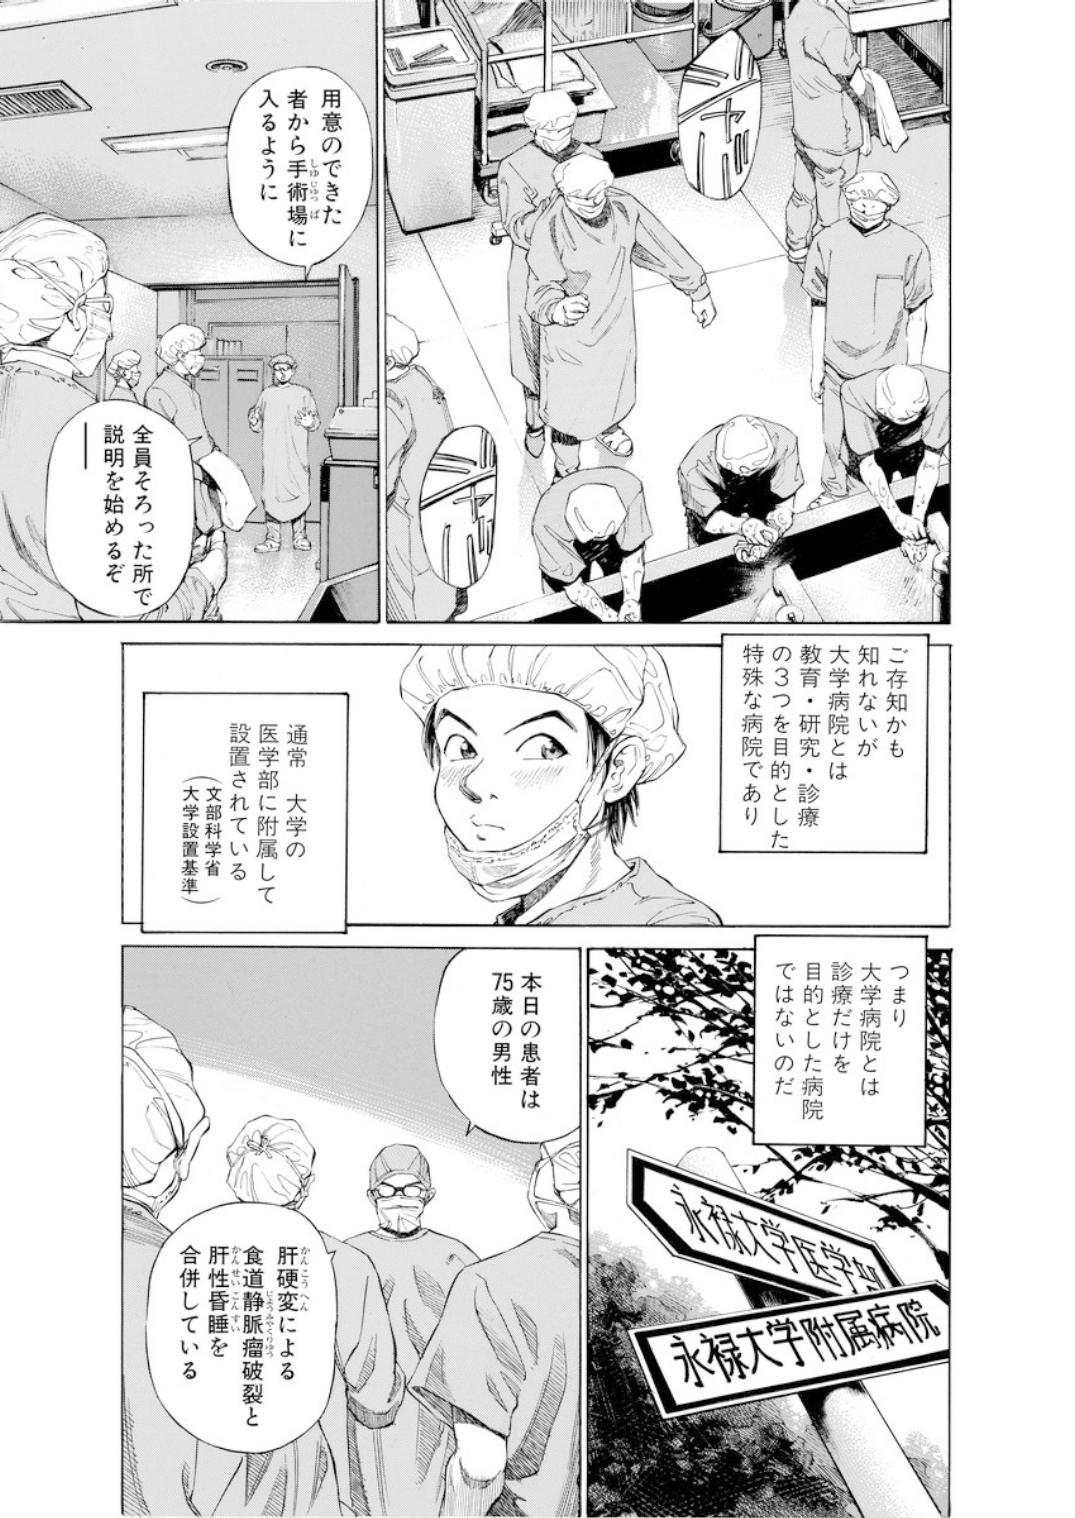 001bj_page-0067.jpg